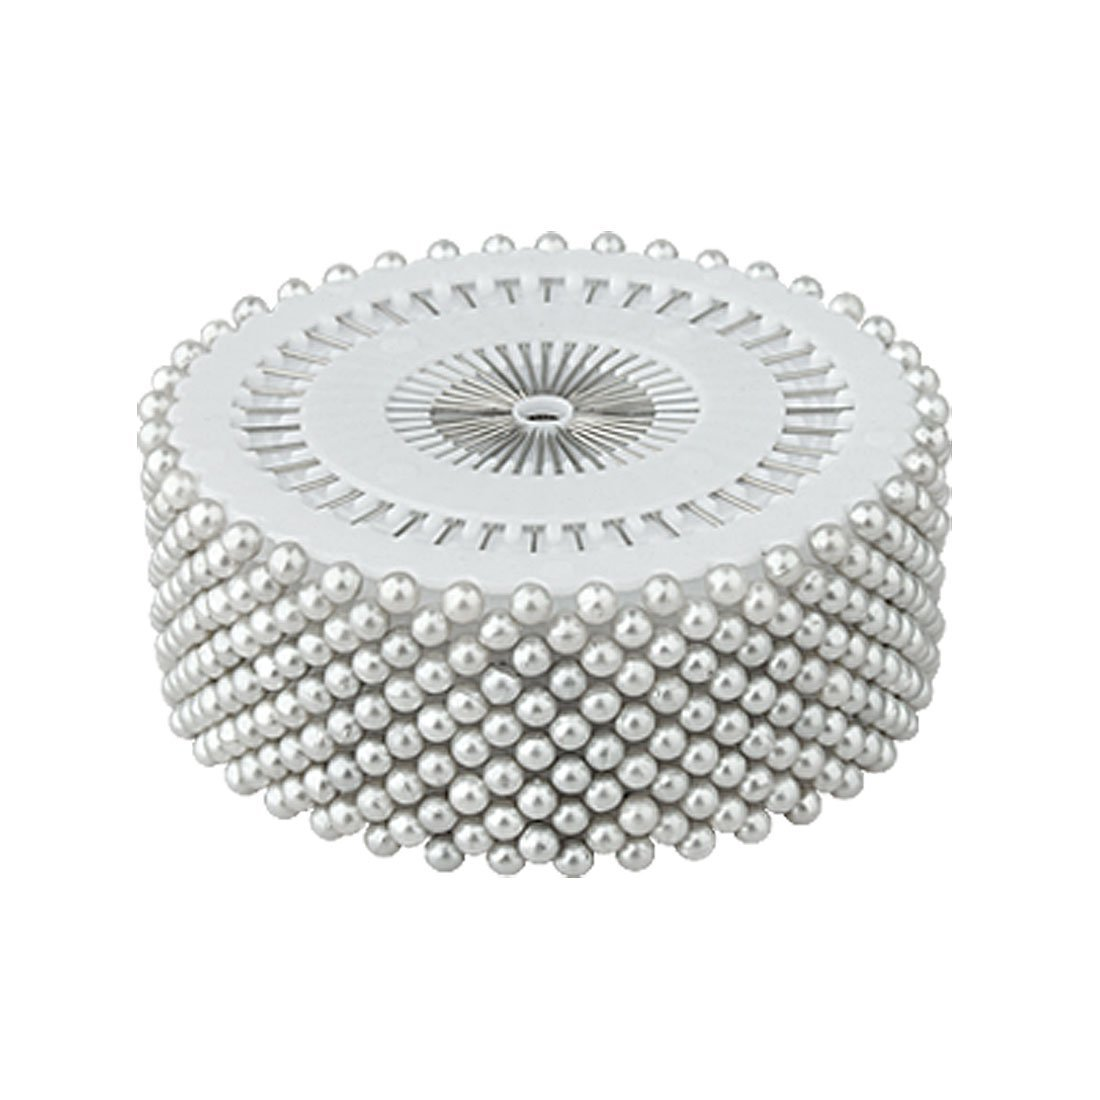 La Tartelette Decorative Round Pearl Straight Head Pins, 1.5 inch - 480 Pcs (White) LTCS-00619